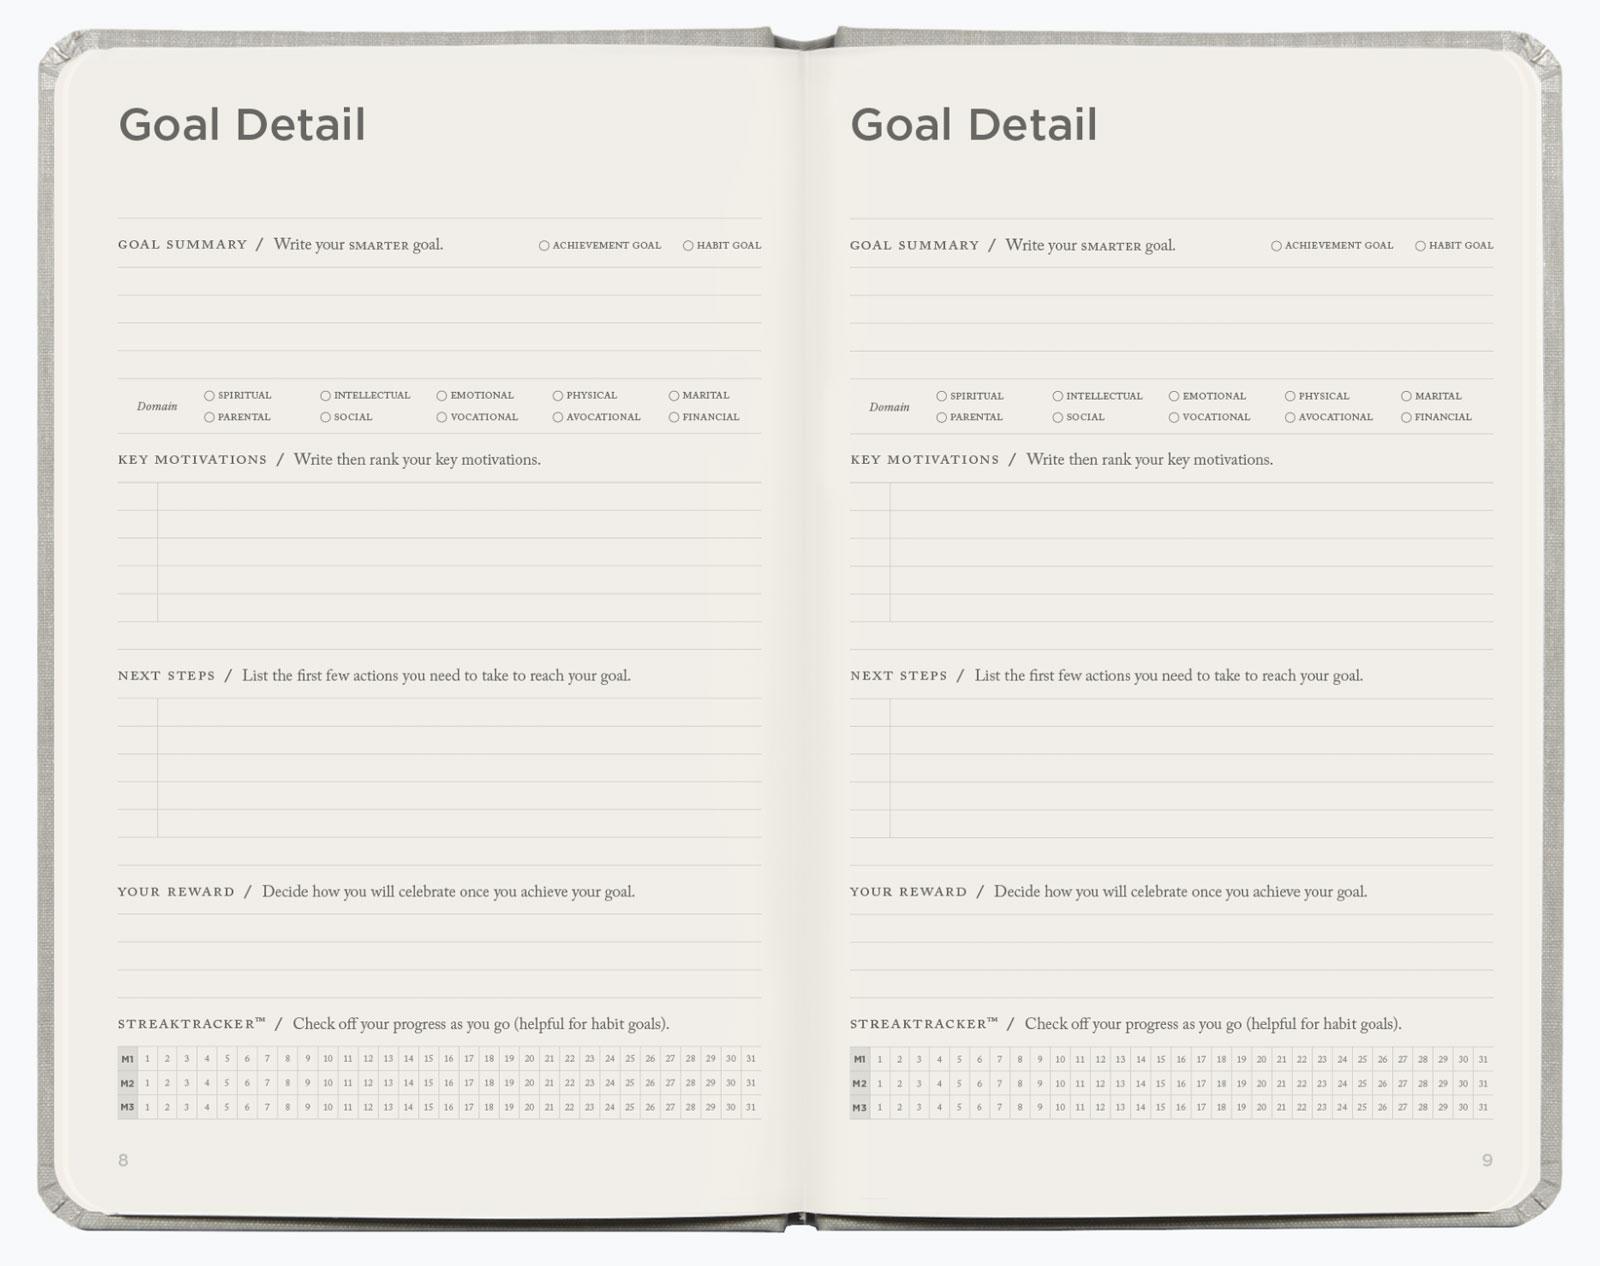 Break down your goal details